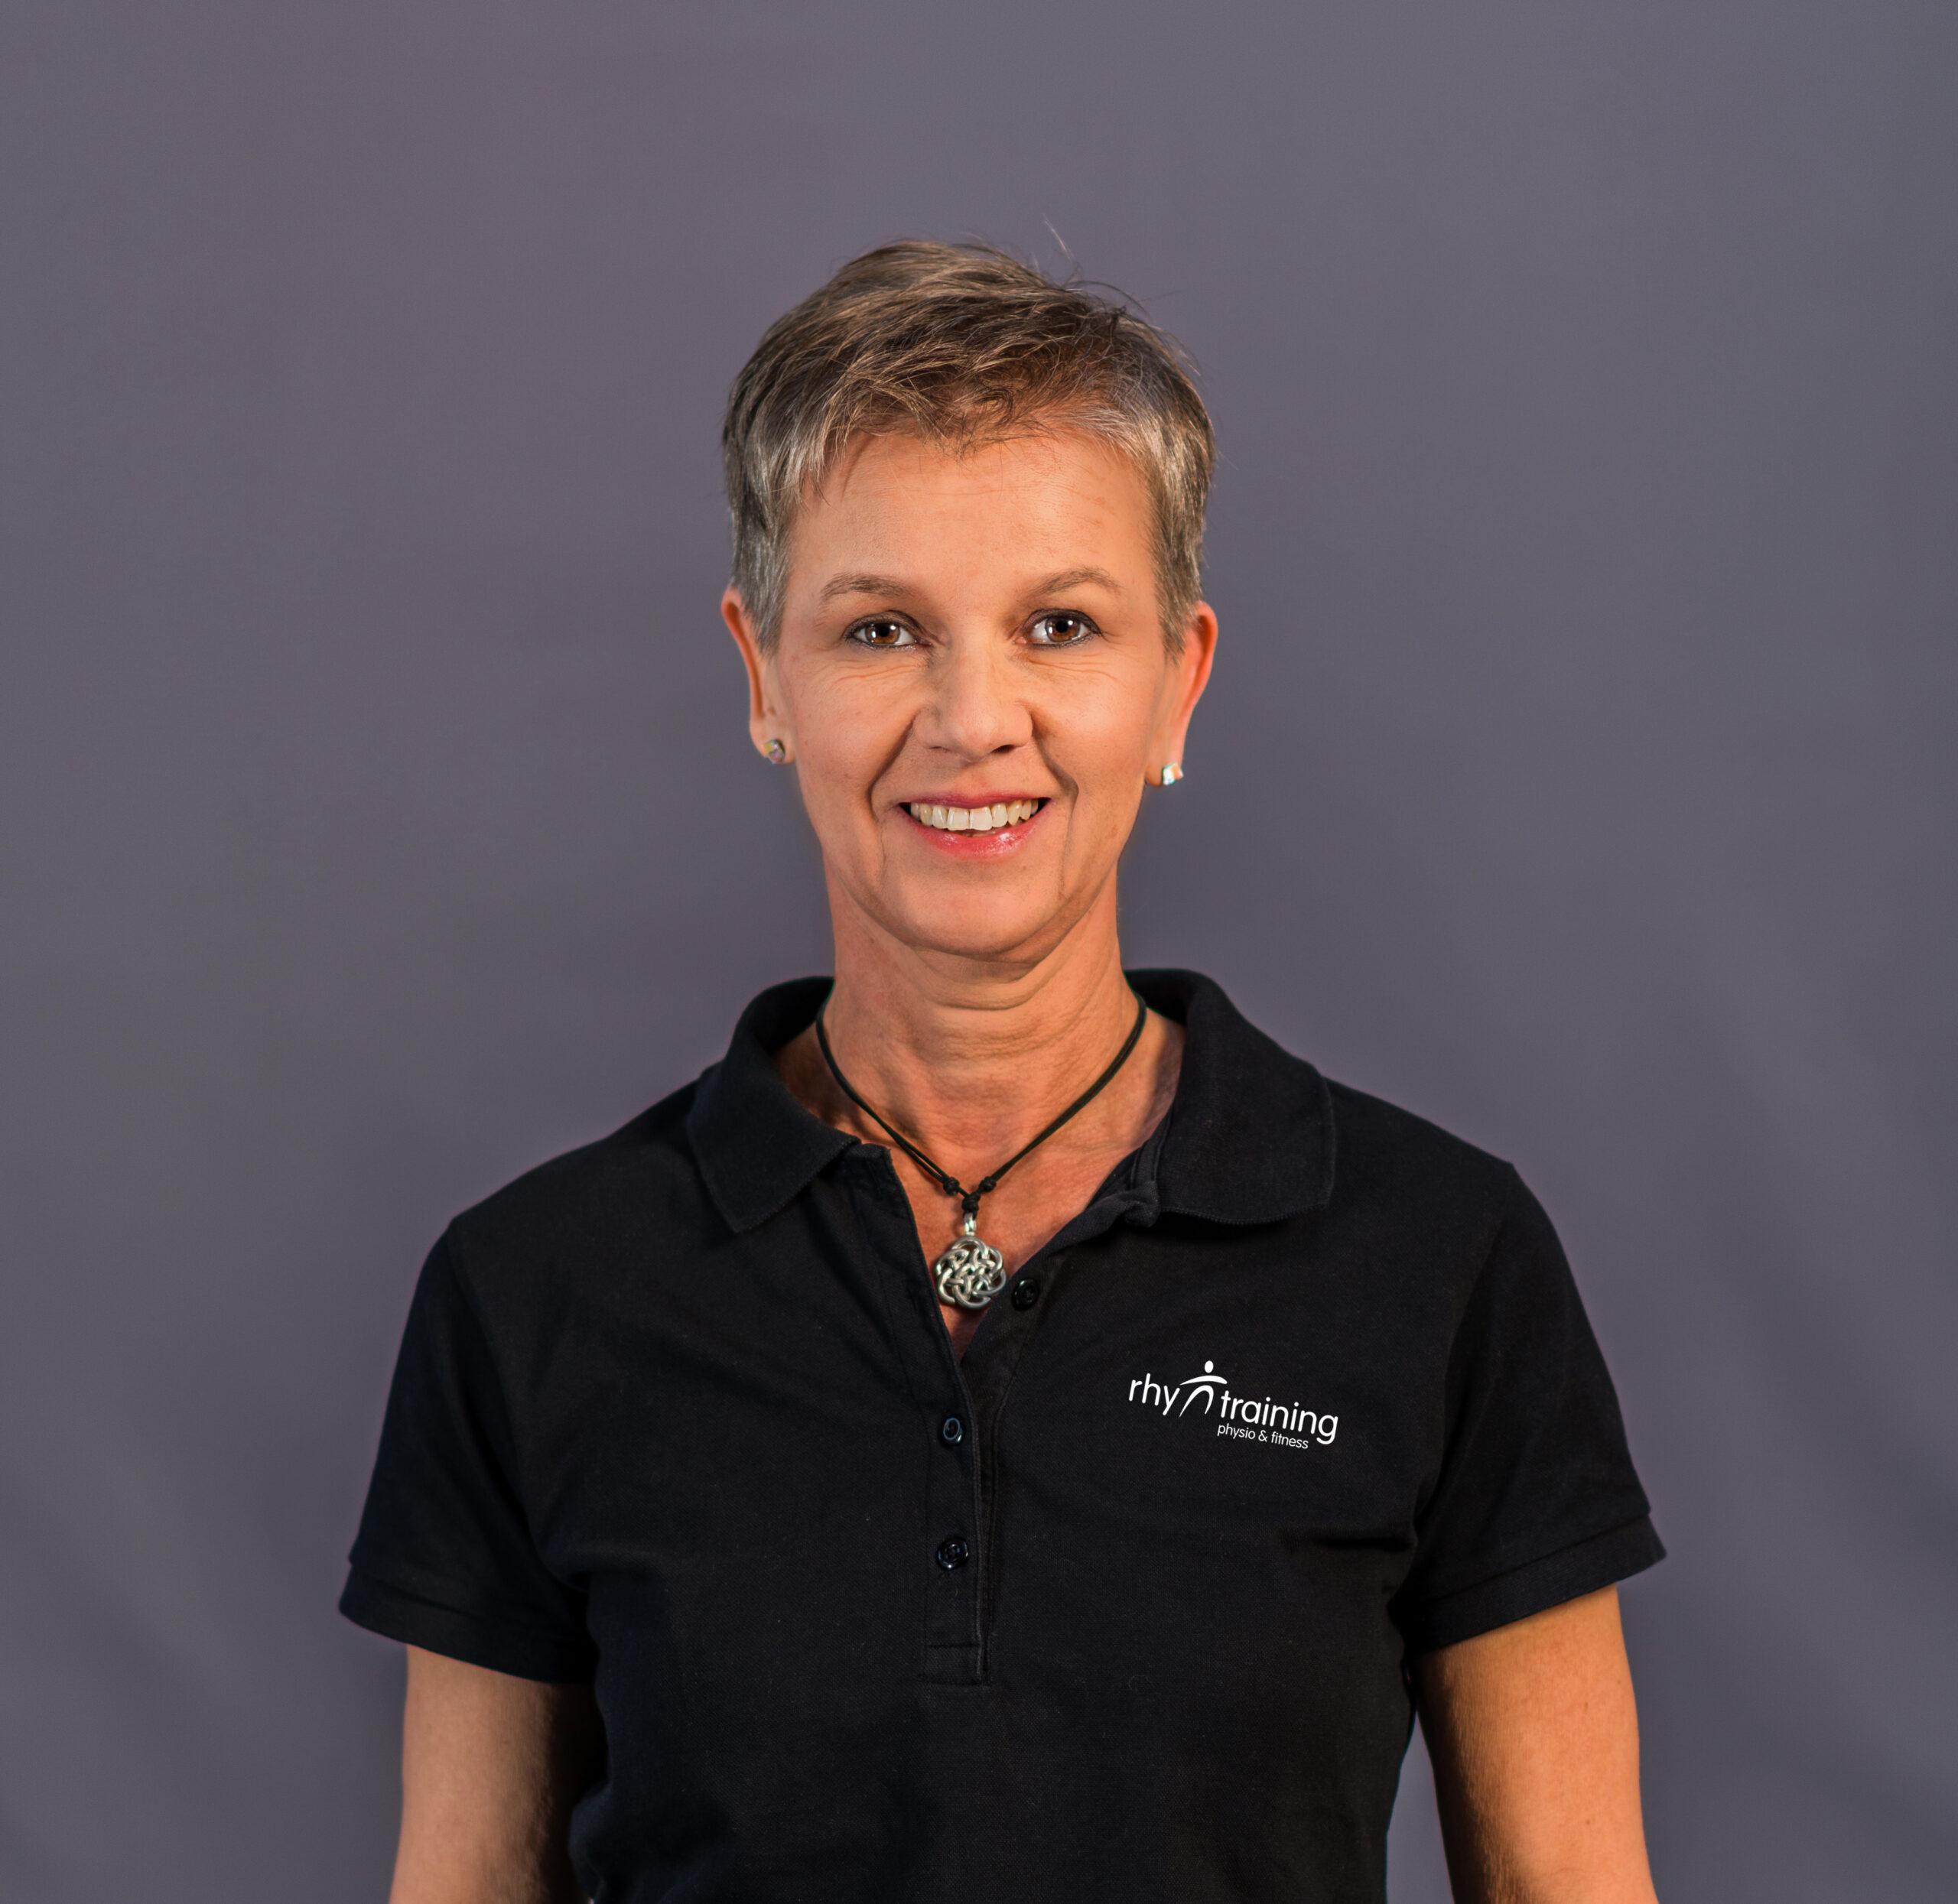 rhytraining - physio & fitness stein am rhein | Irene Kofler